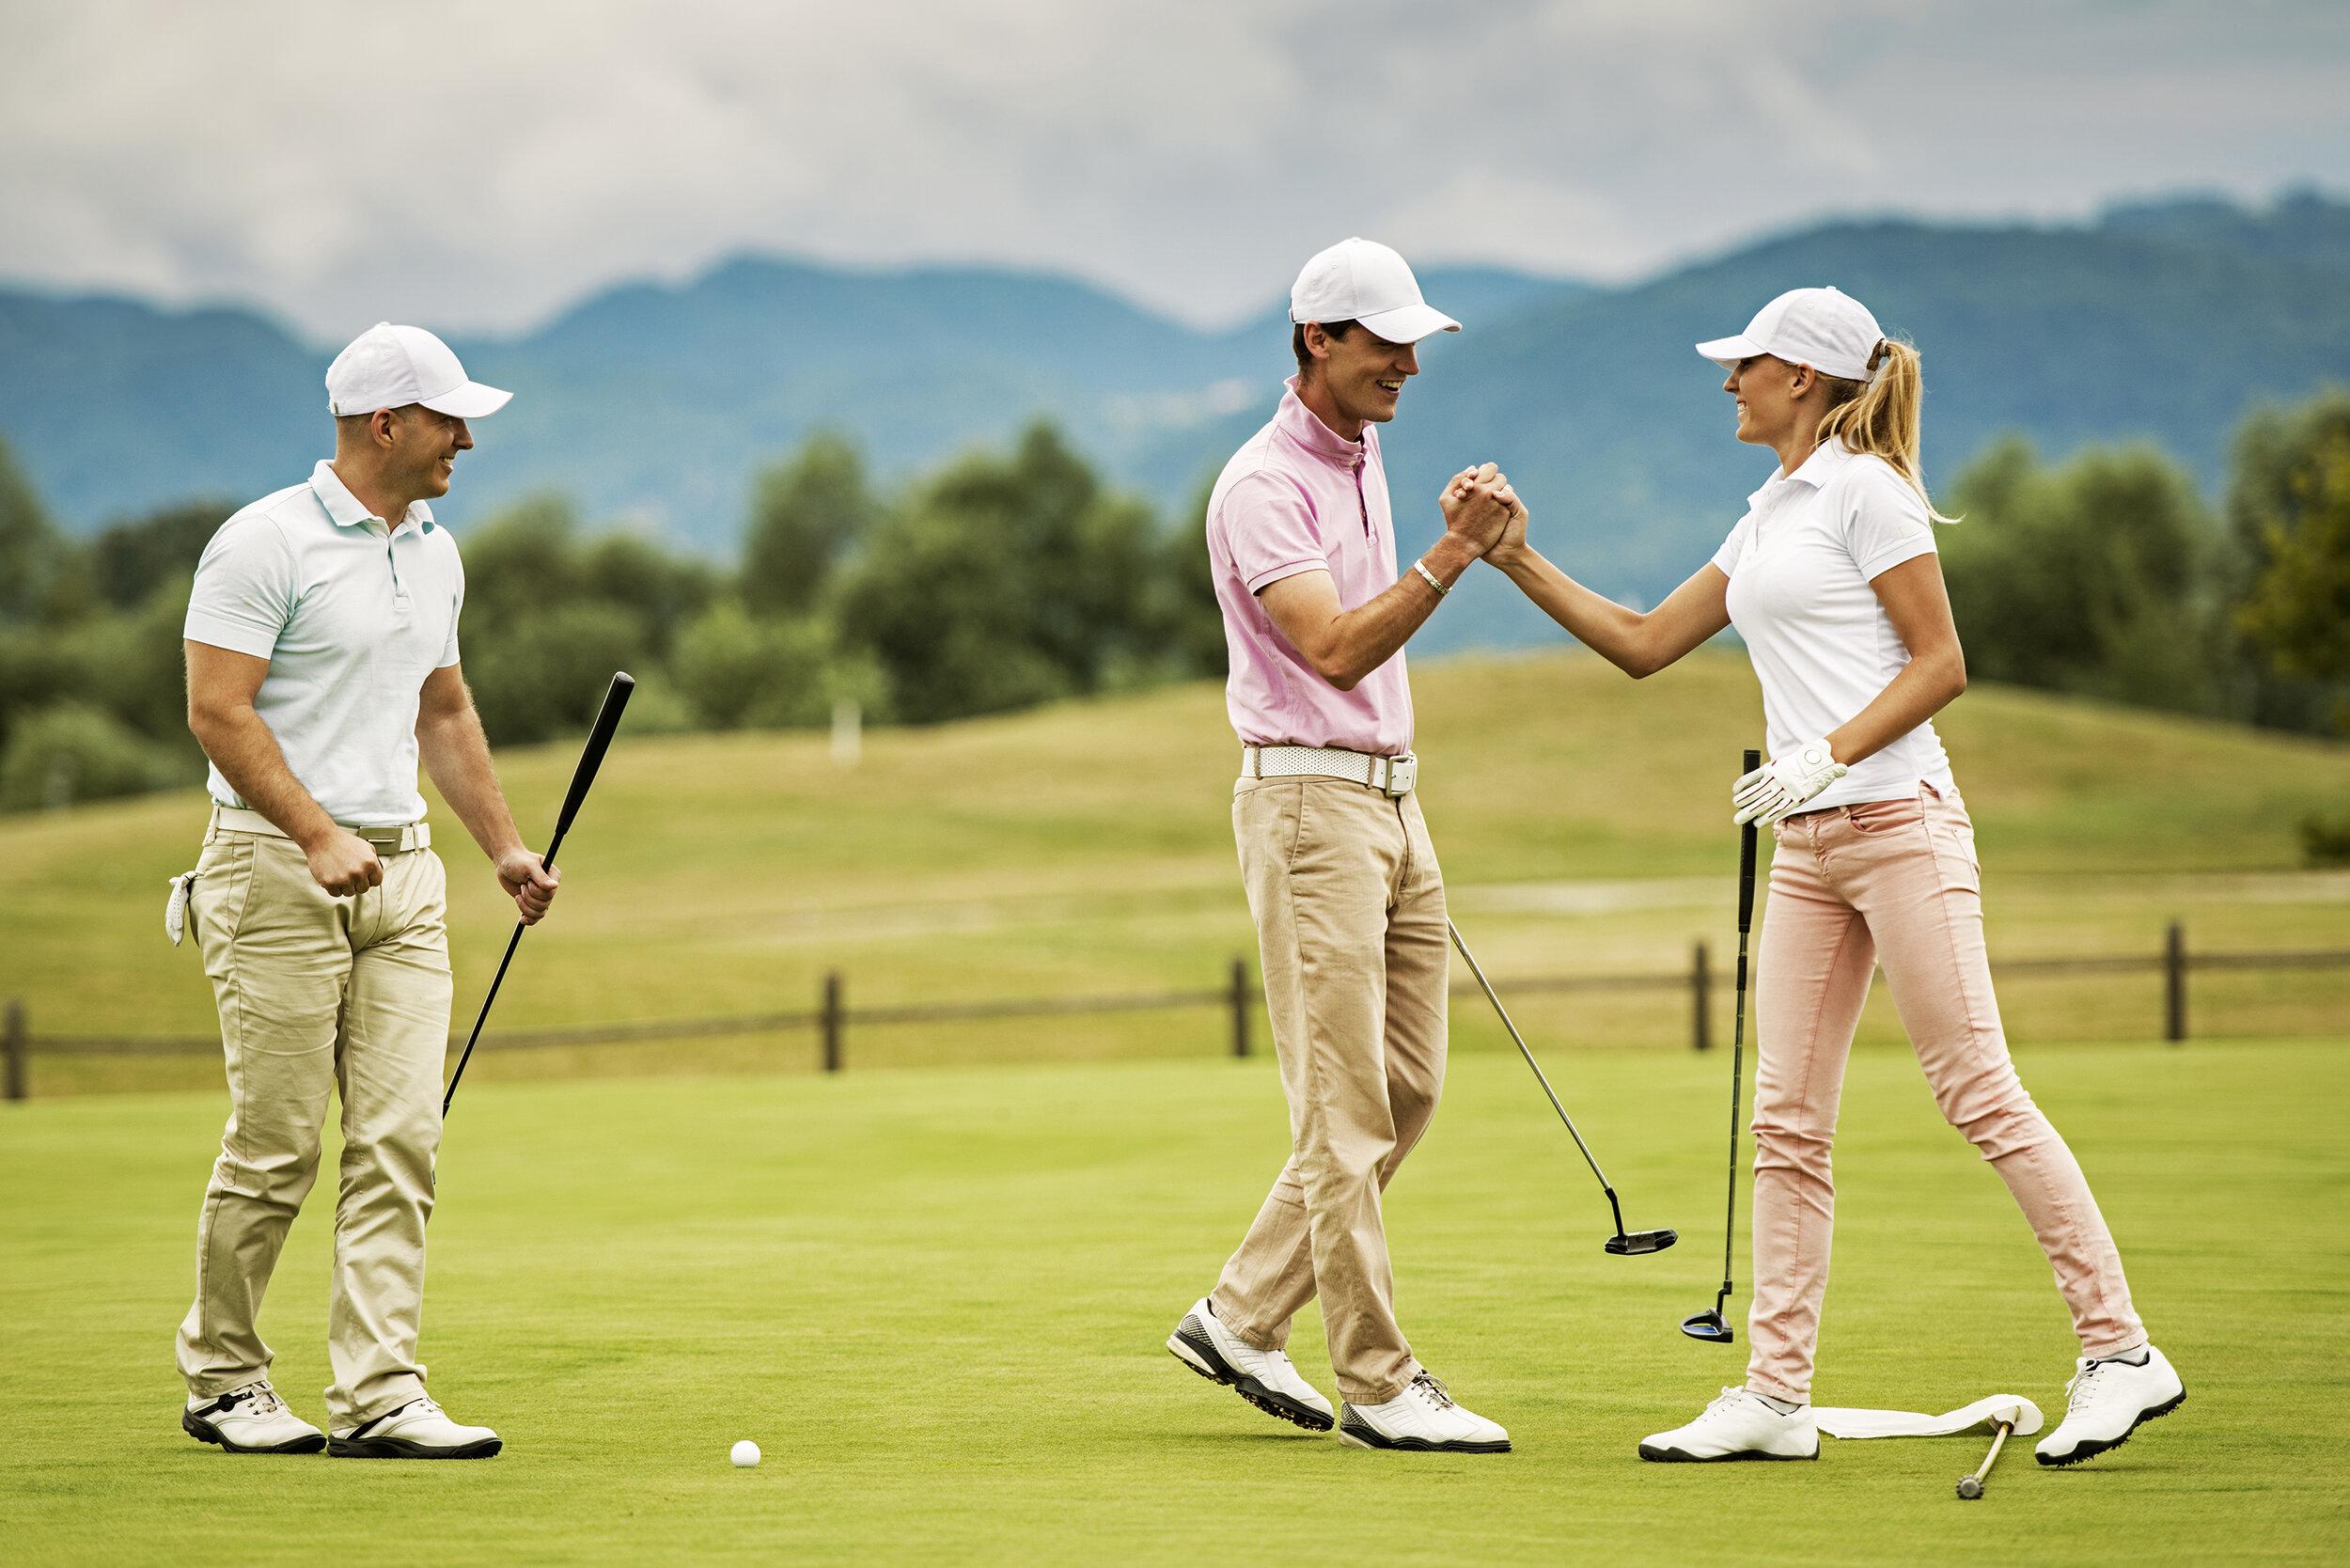 Golf Business Recruitment — WellPlayed   Golf Business Consultancy